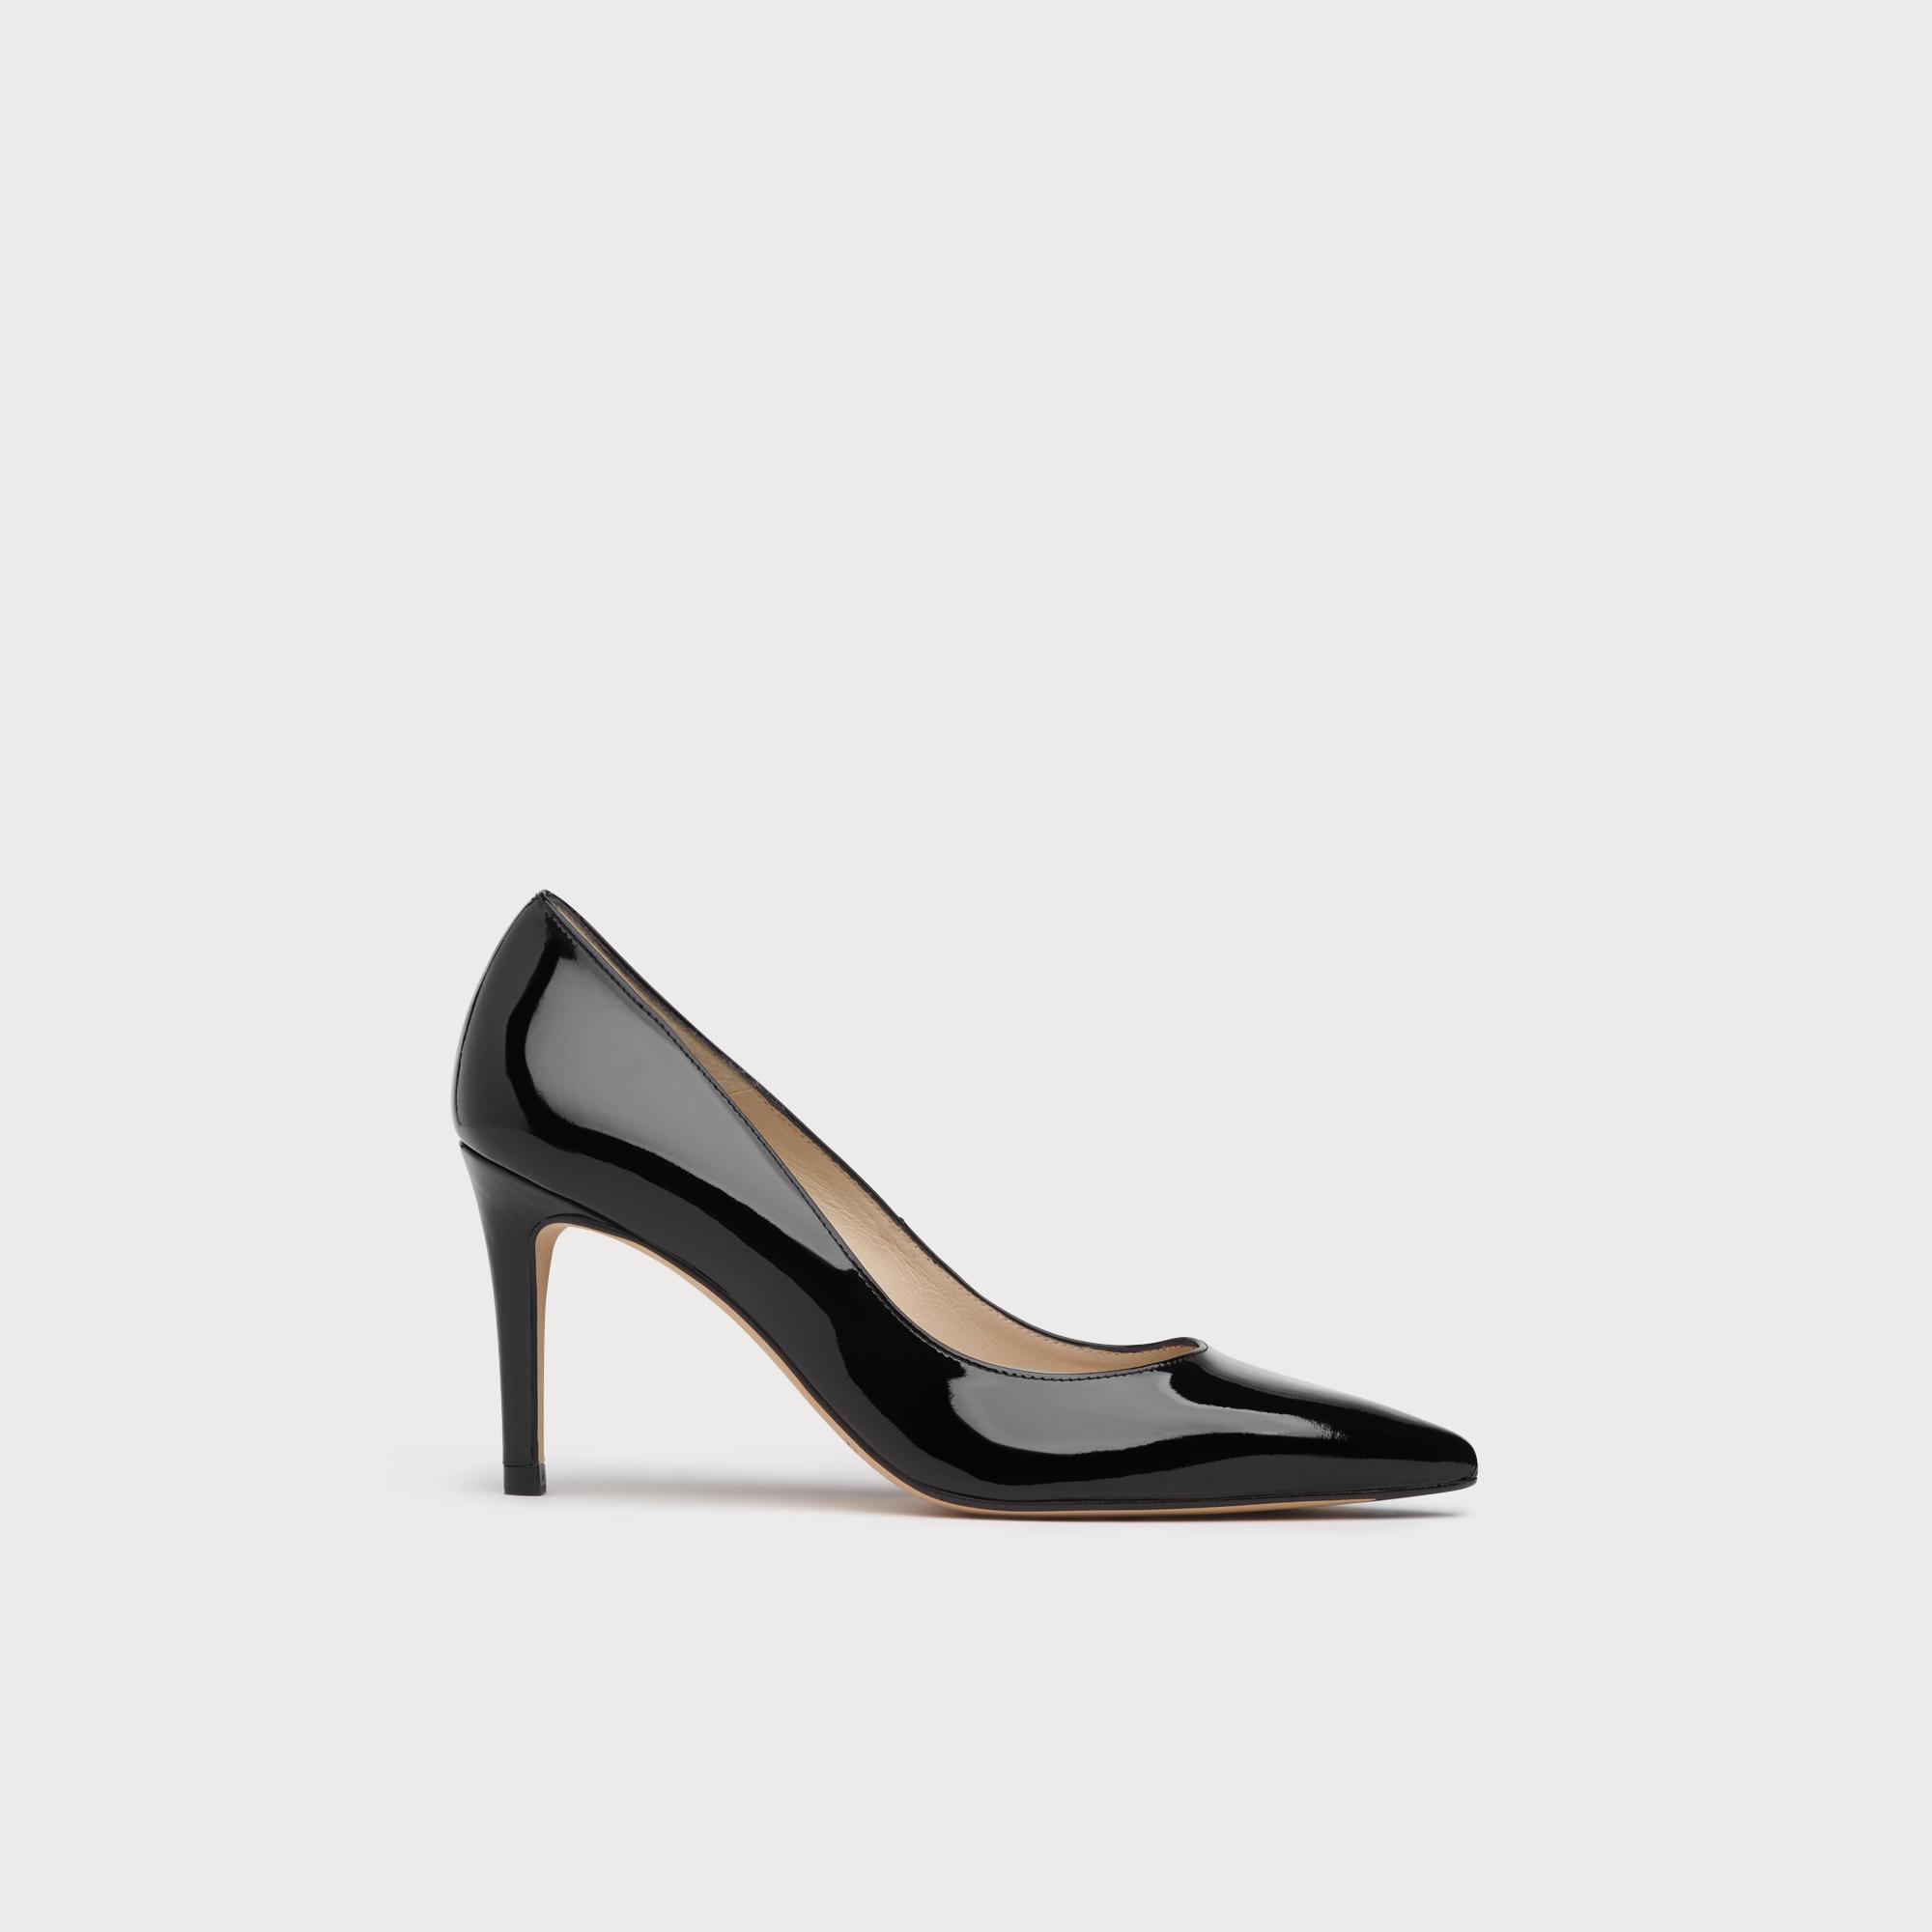 645969e1b1 Florete Patent Leather Pointed Toe Court   Shoes   L.K.Bennett